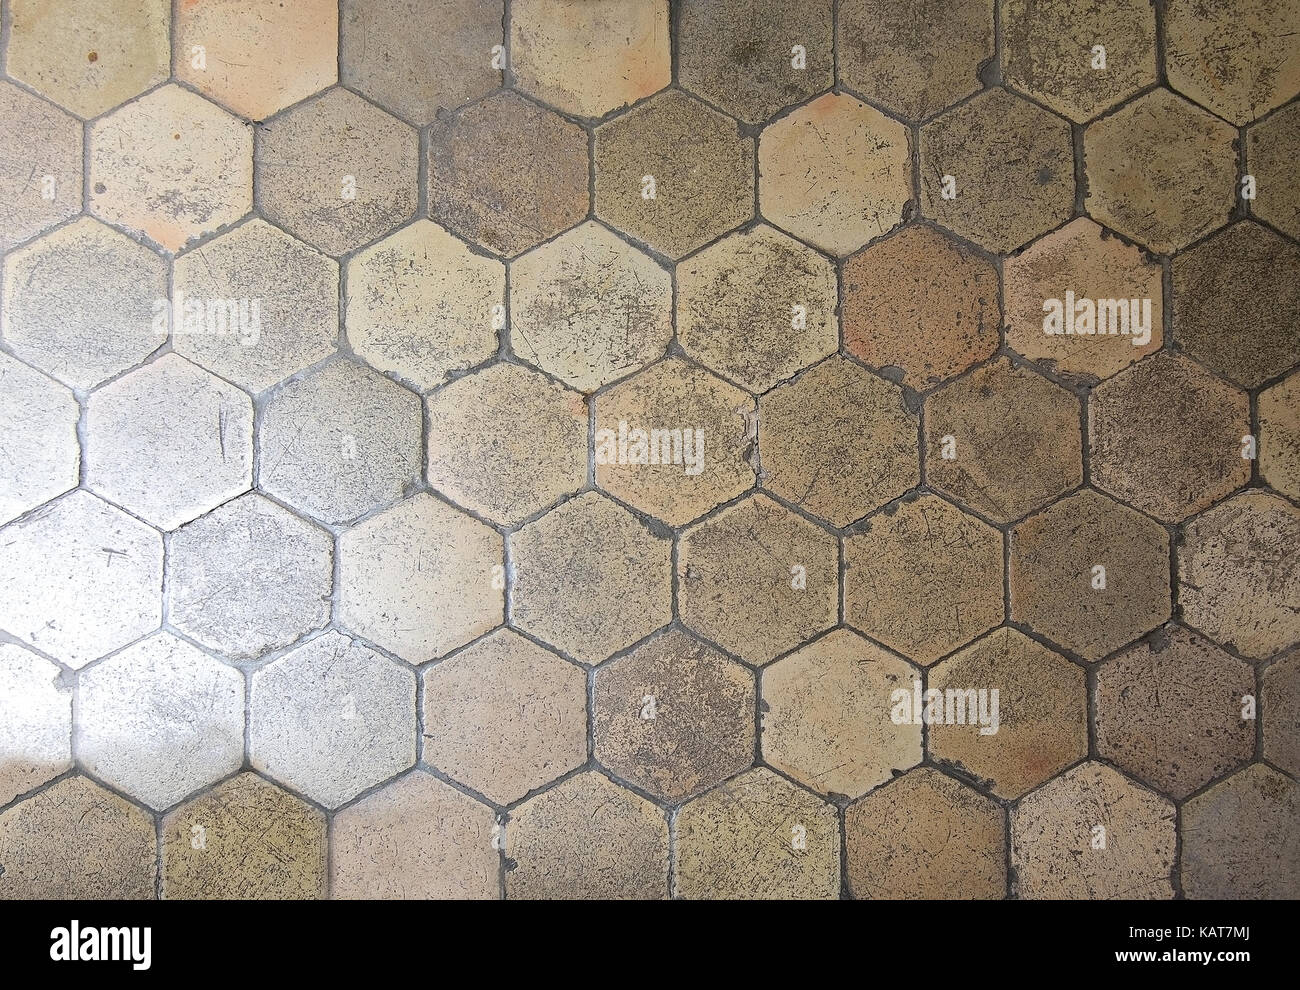 Texture Piastrelle Esagonali Abstract la texture della